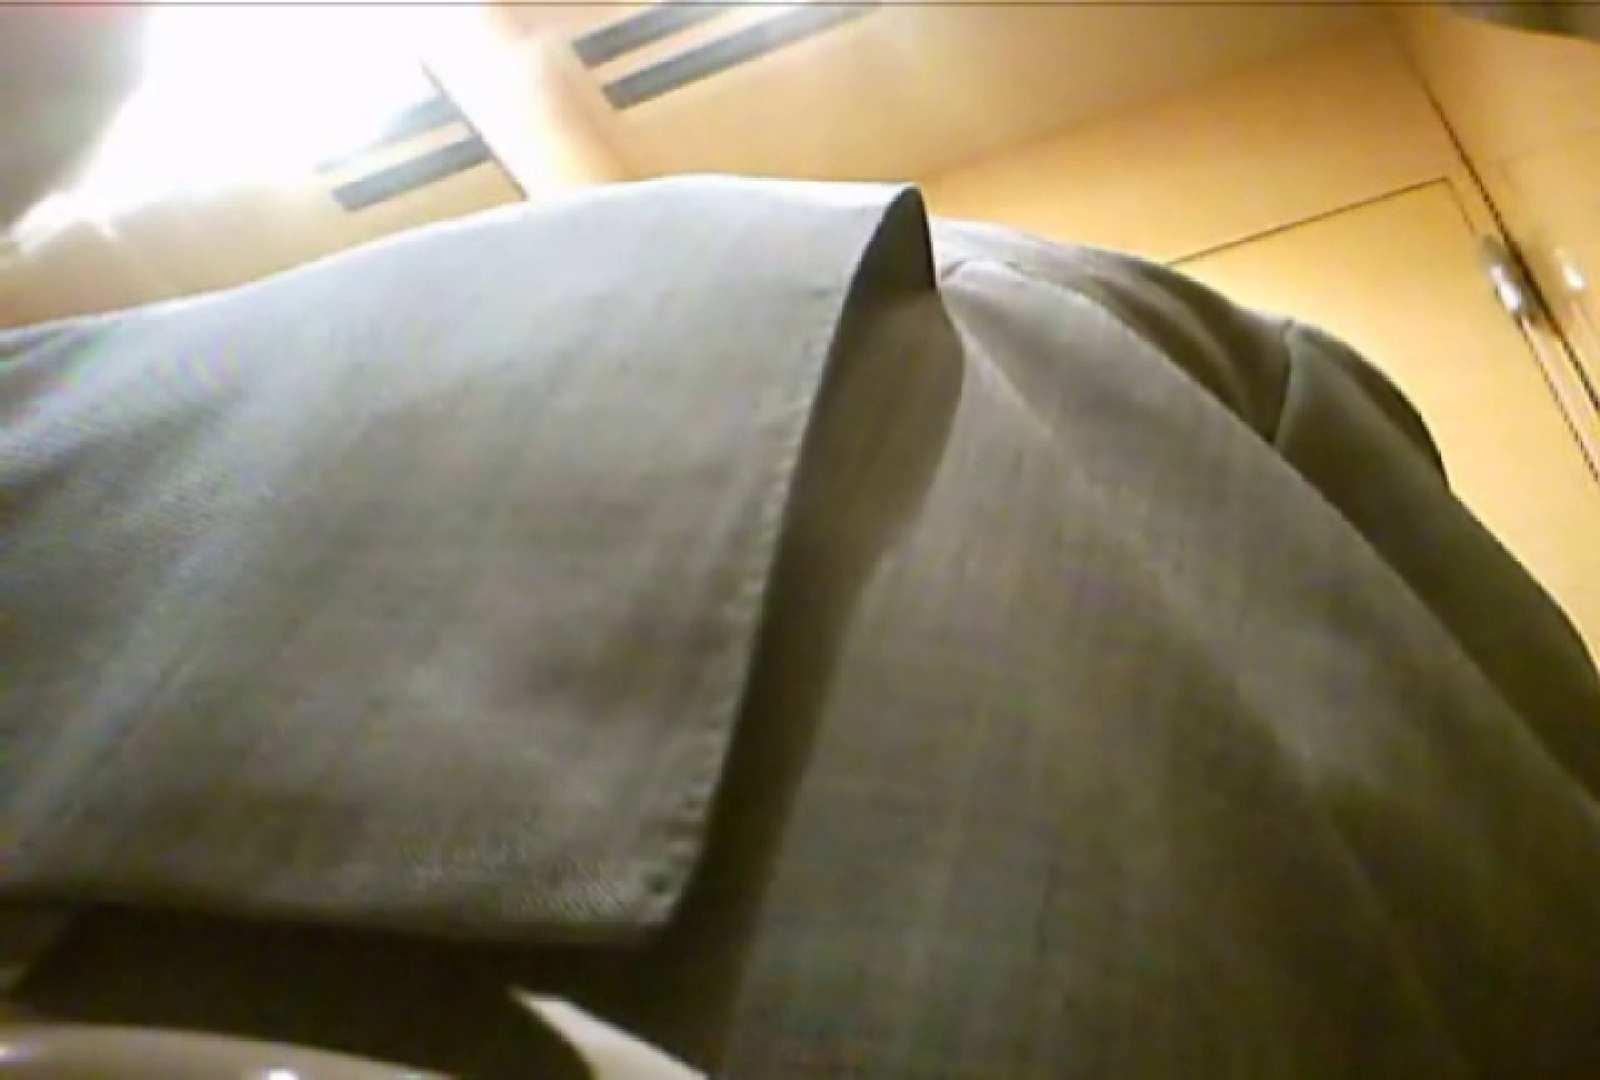 SEASON 2ND!掴み取りさんの洗面所覗き!in新幹線!VOL.02 男パラダイス ゲイフリーエロ画像 13画像 2